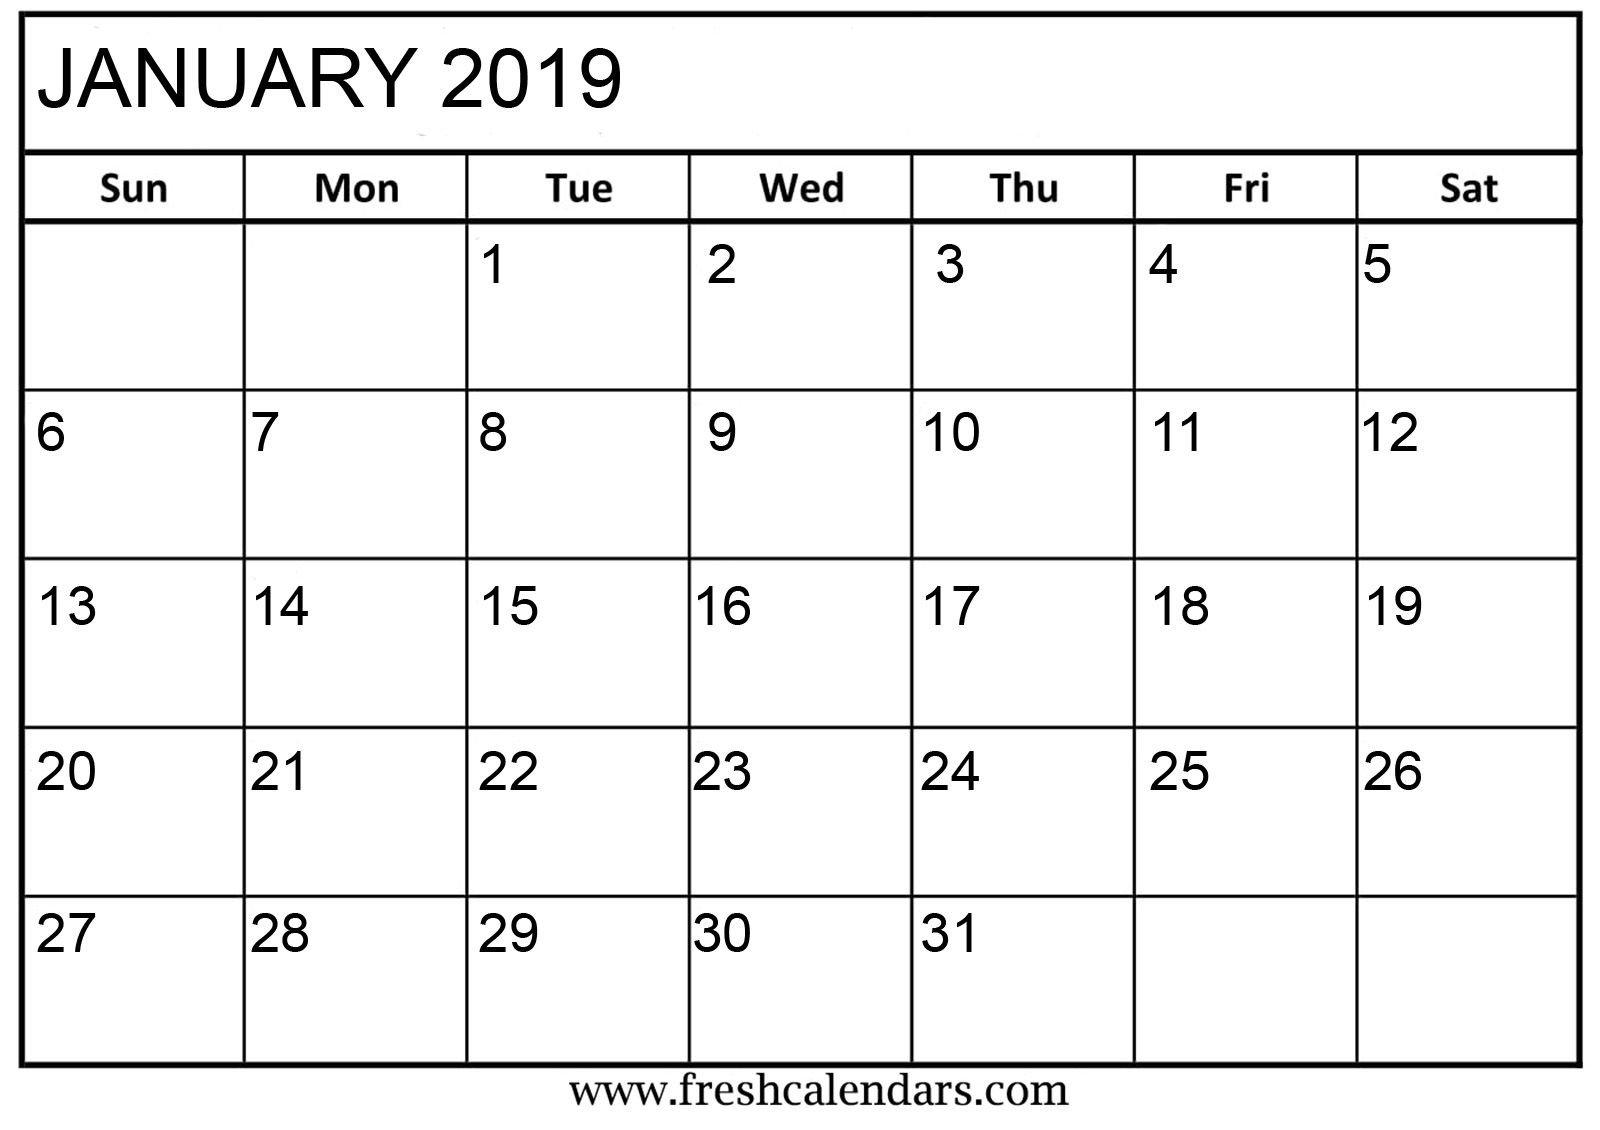 Printable January 2019 Calendar #january2019 #january2019Calendar Calendar 2019 Printable January